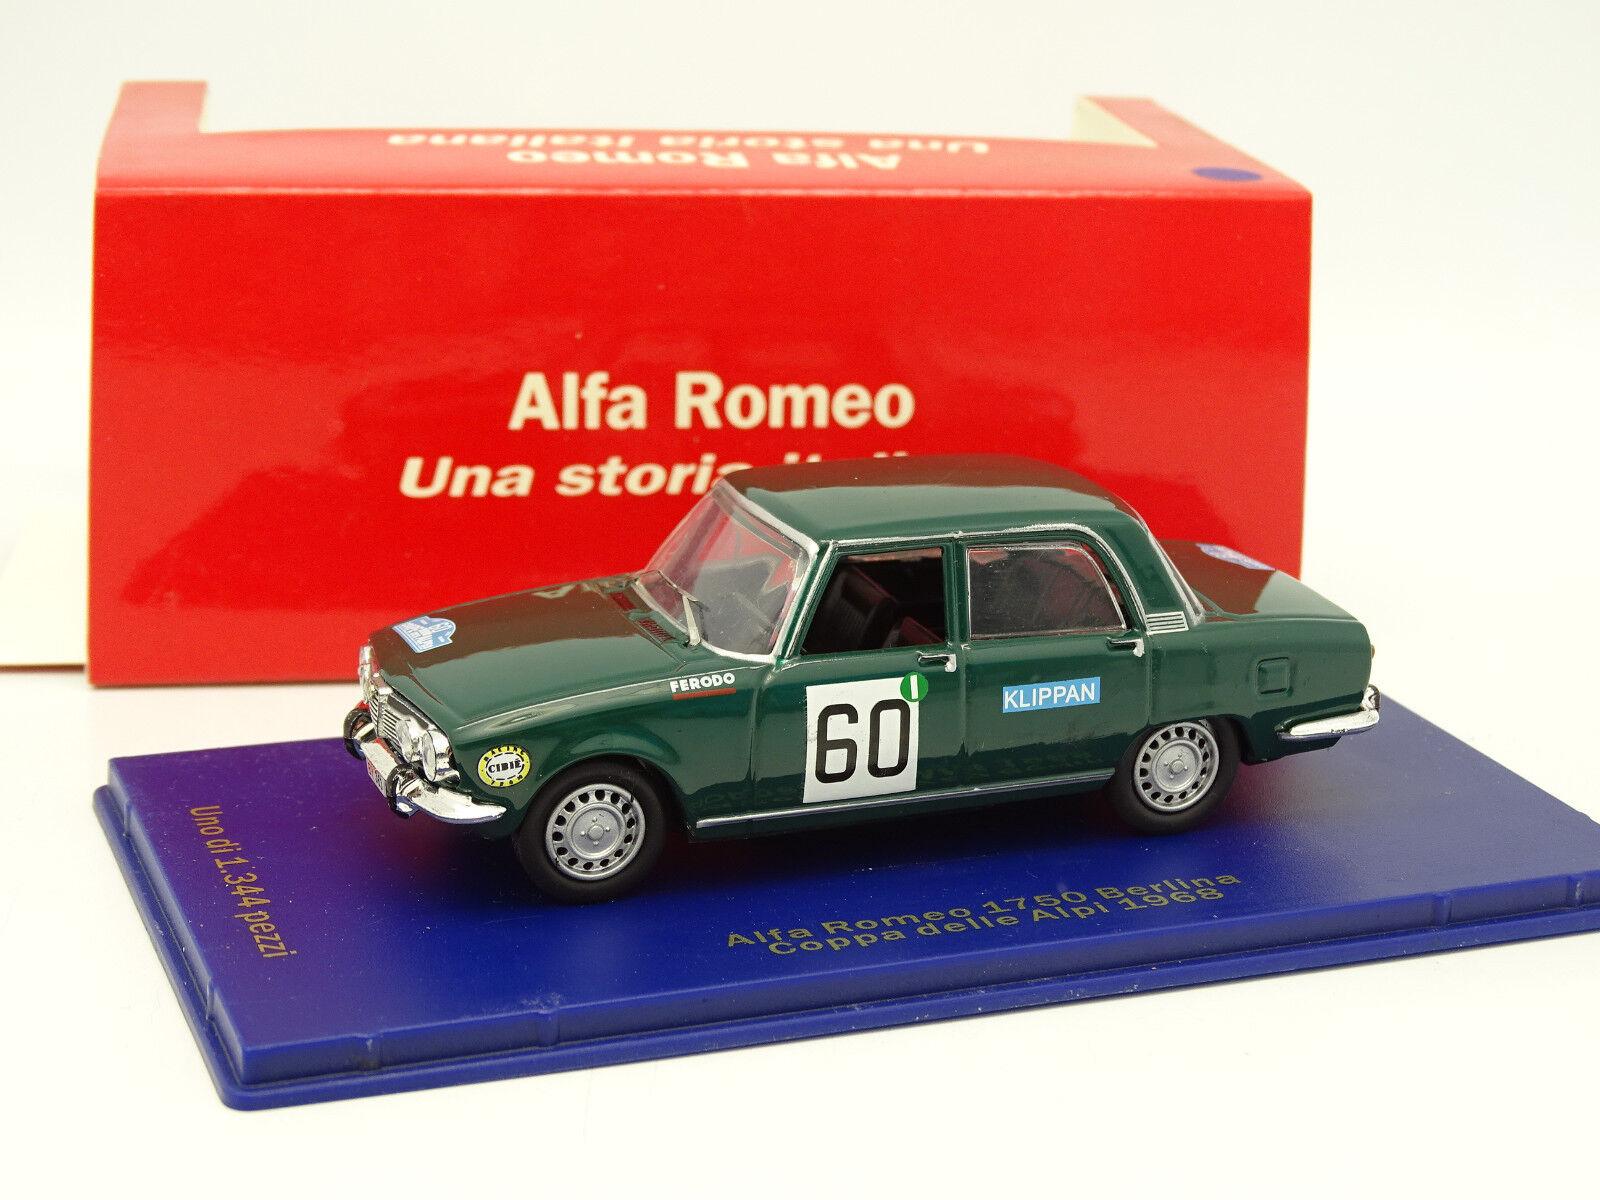 M4 1 43 - Alfa Romeo 1750 Coupe of the Alps 1968